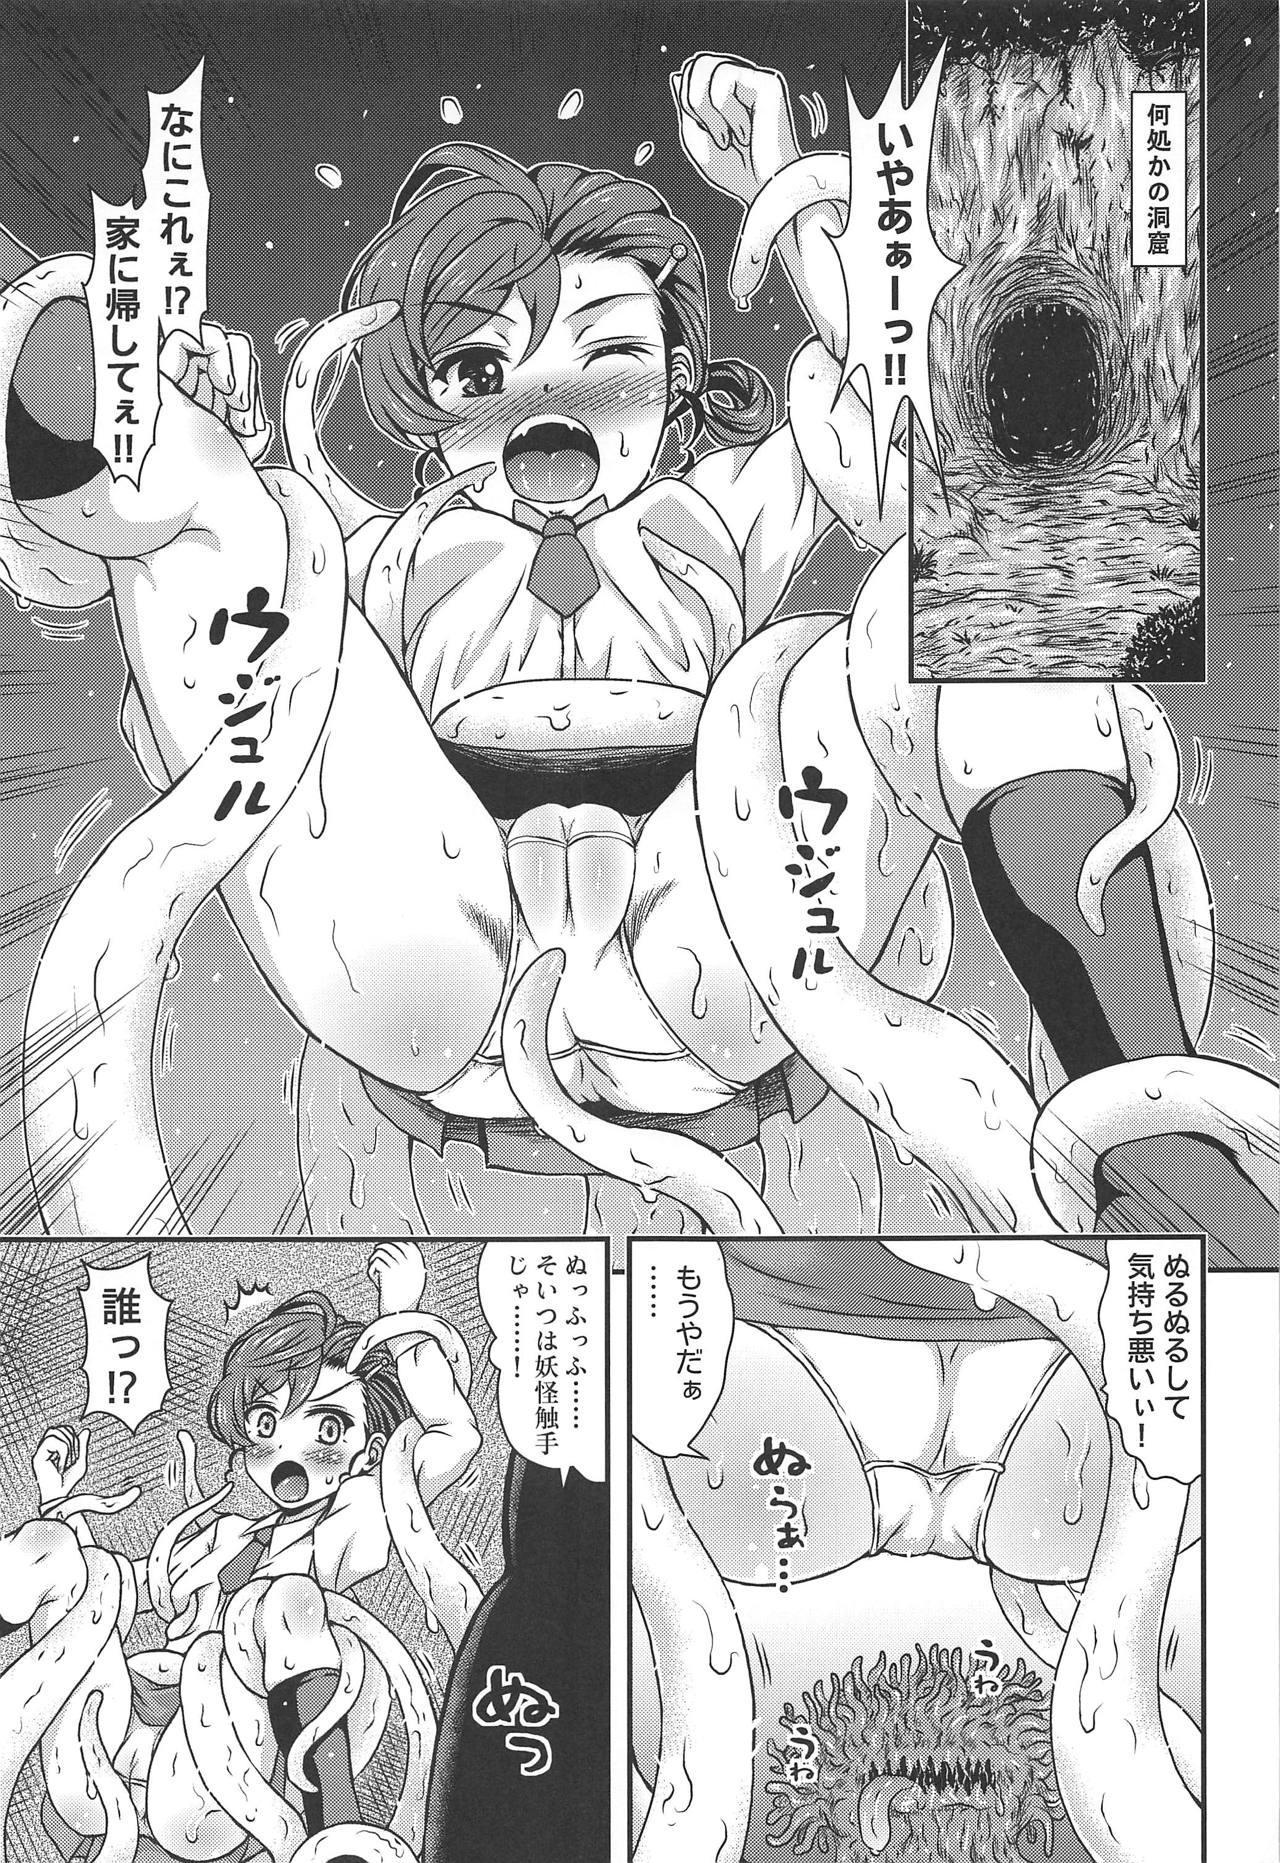 ManaNeko no Naka 1